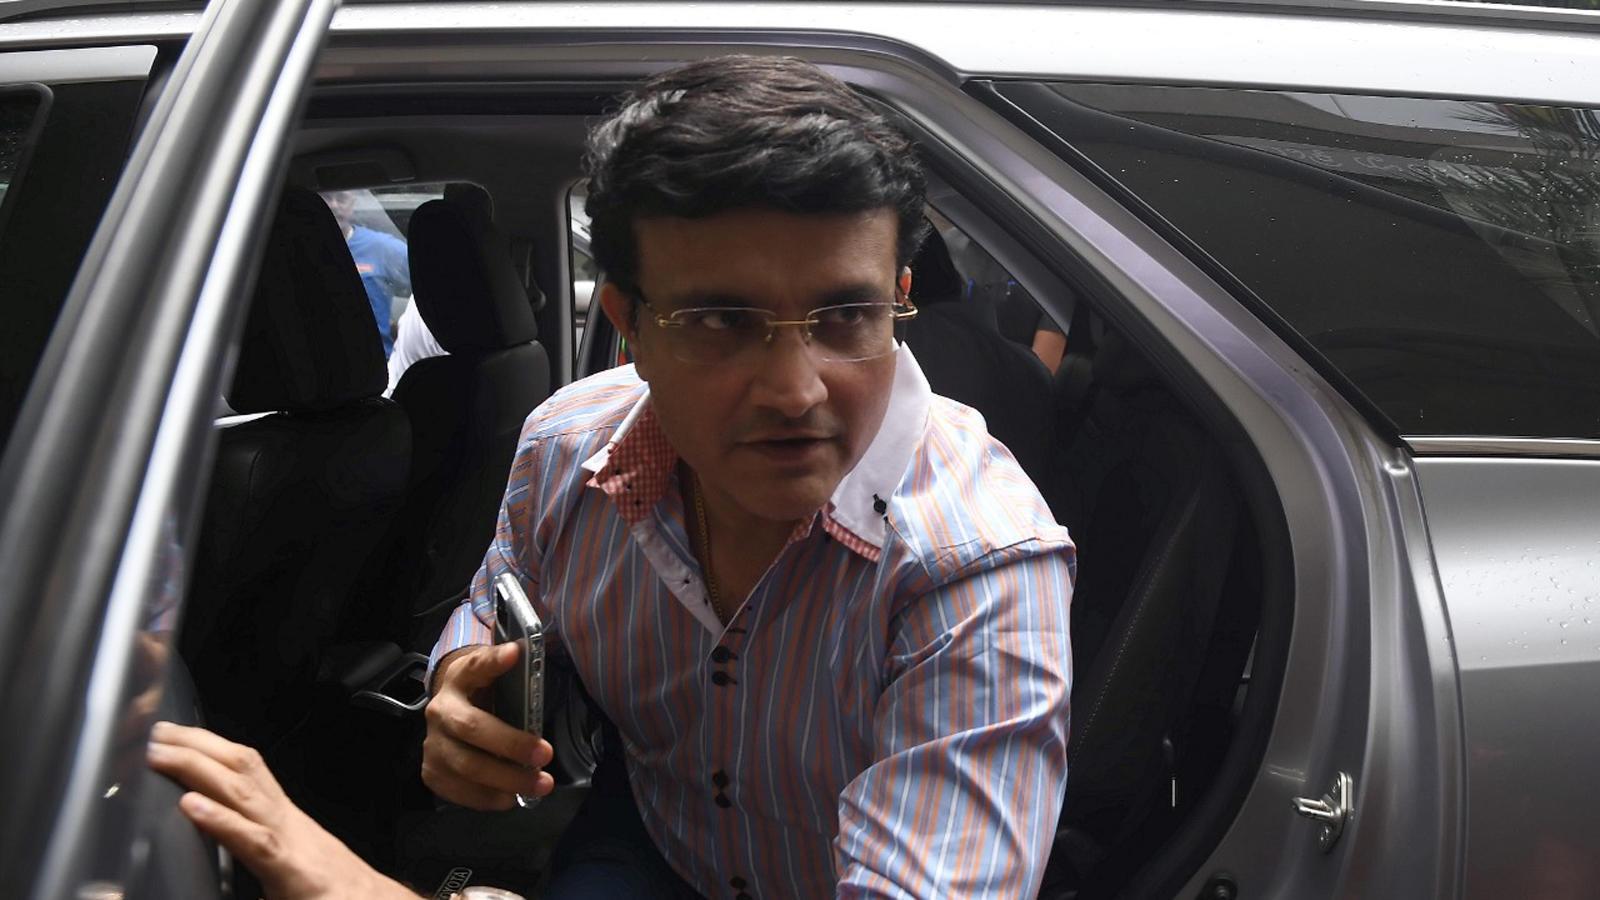 sourav-ganguly-arrives-in-bengaluru-to-meet-rahul-dravid